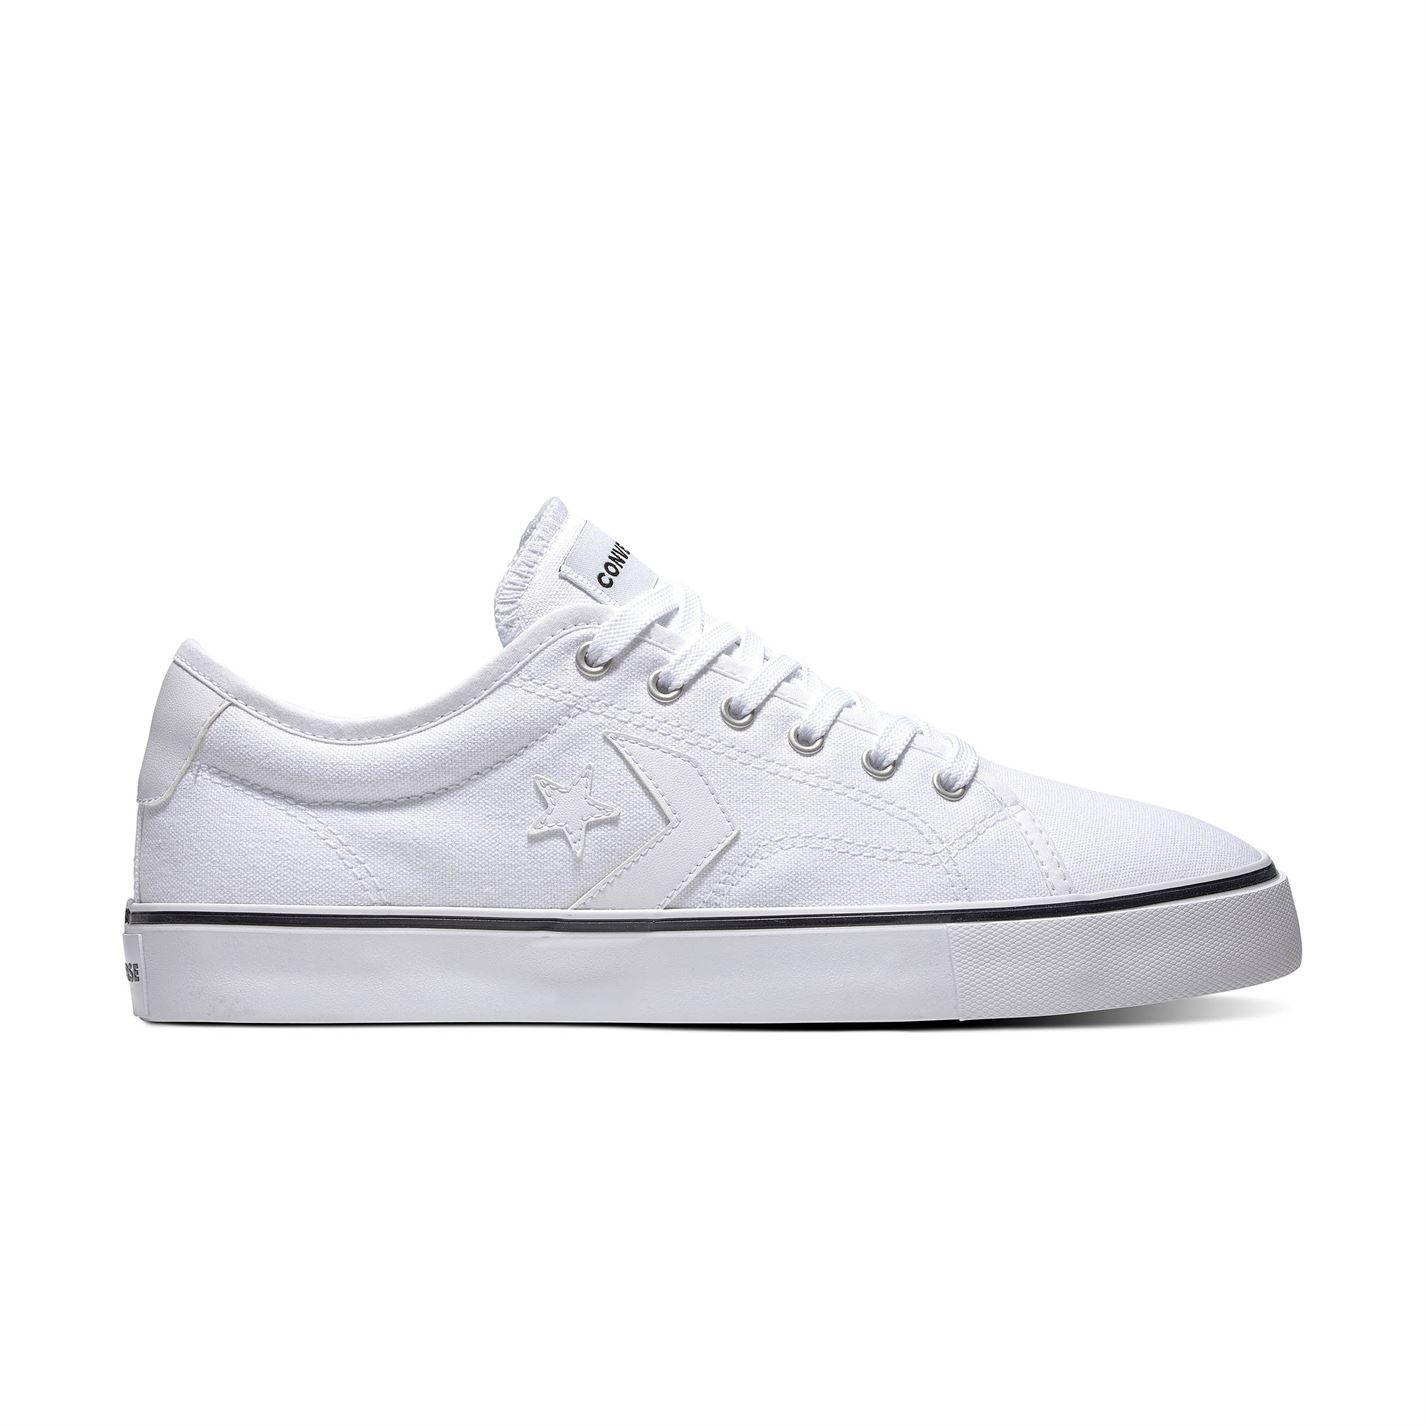 Converse-Ox-REPLAY-Baskets-Pour-Homme-Chaussures-De-Loisirs-Chaussures-Baskets miniature 31